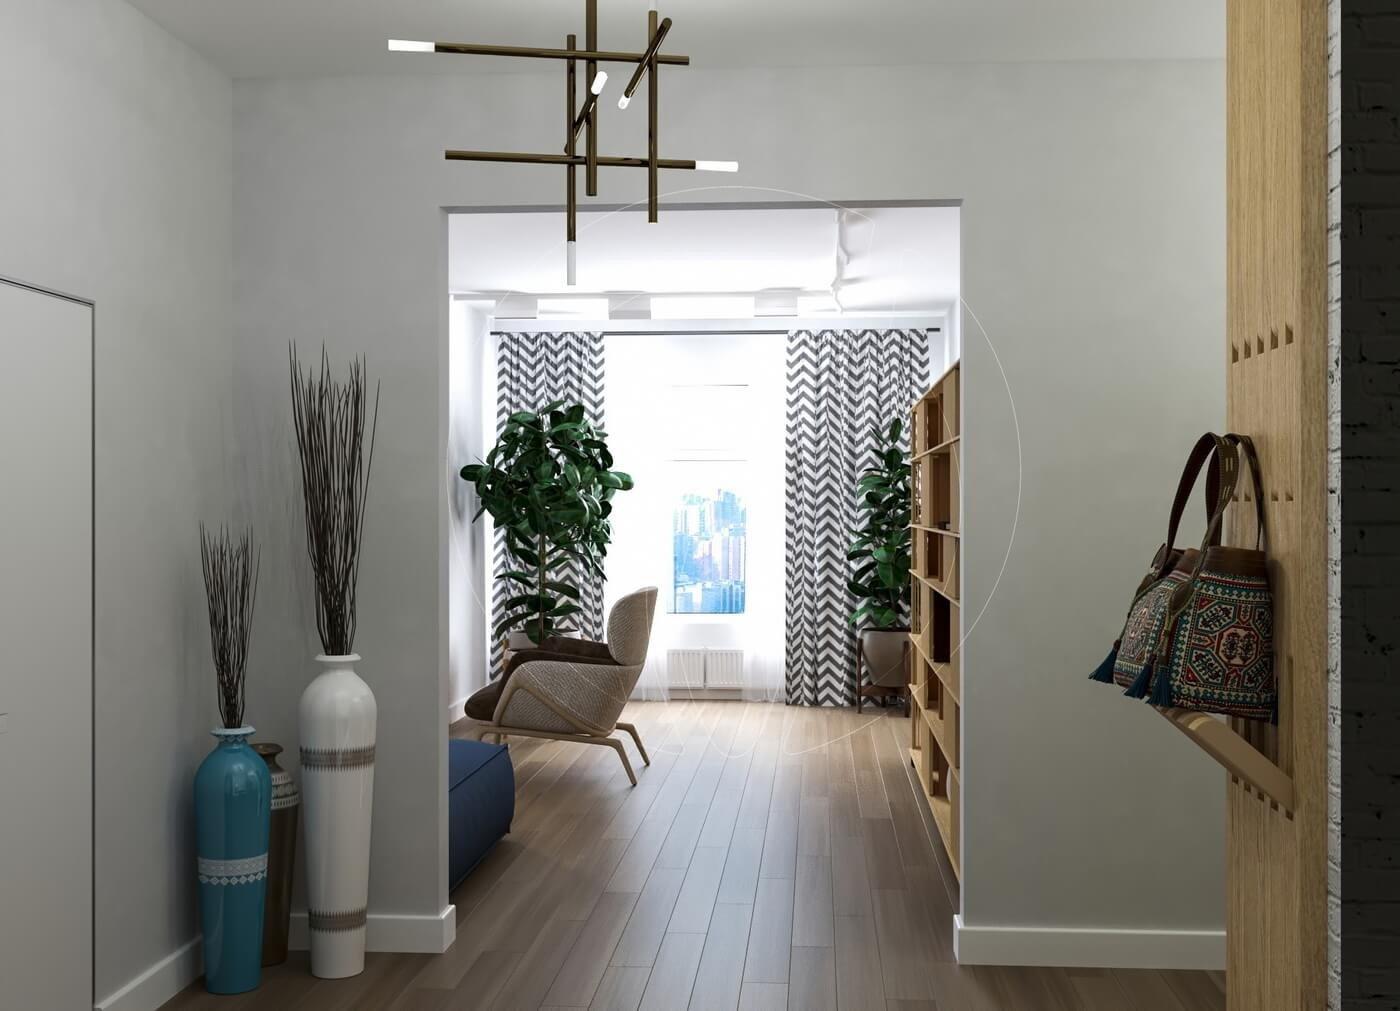 Квартира в скандинавском стиле и стиле LOFT. Прихожая и коридор